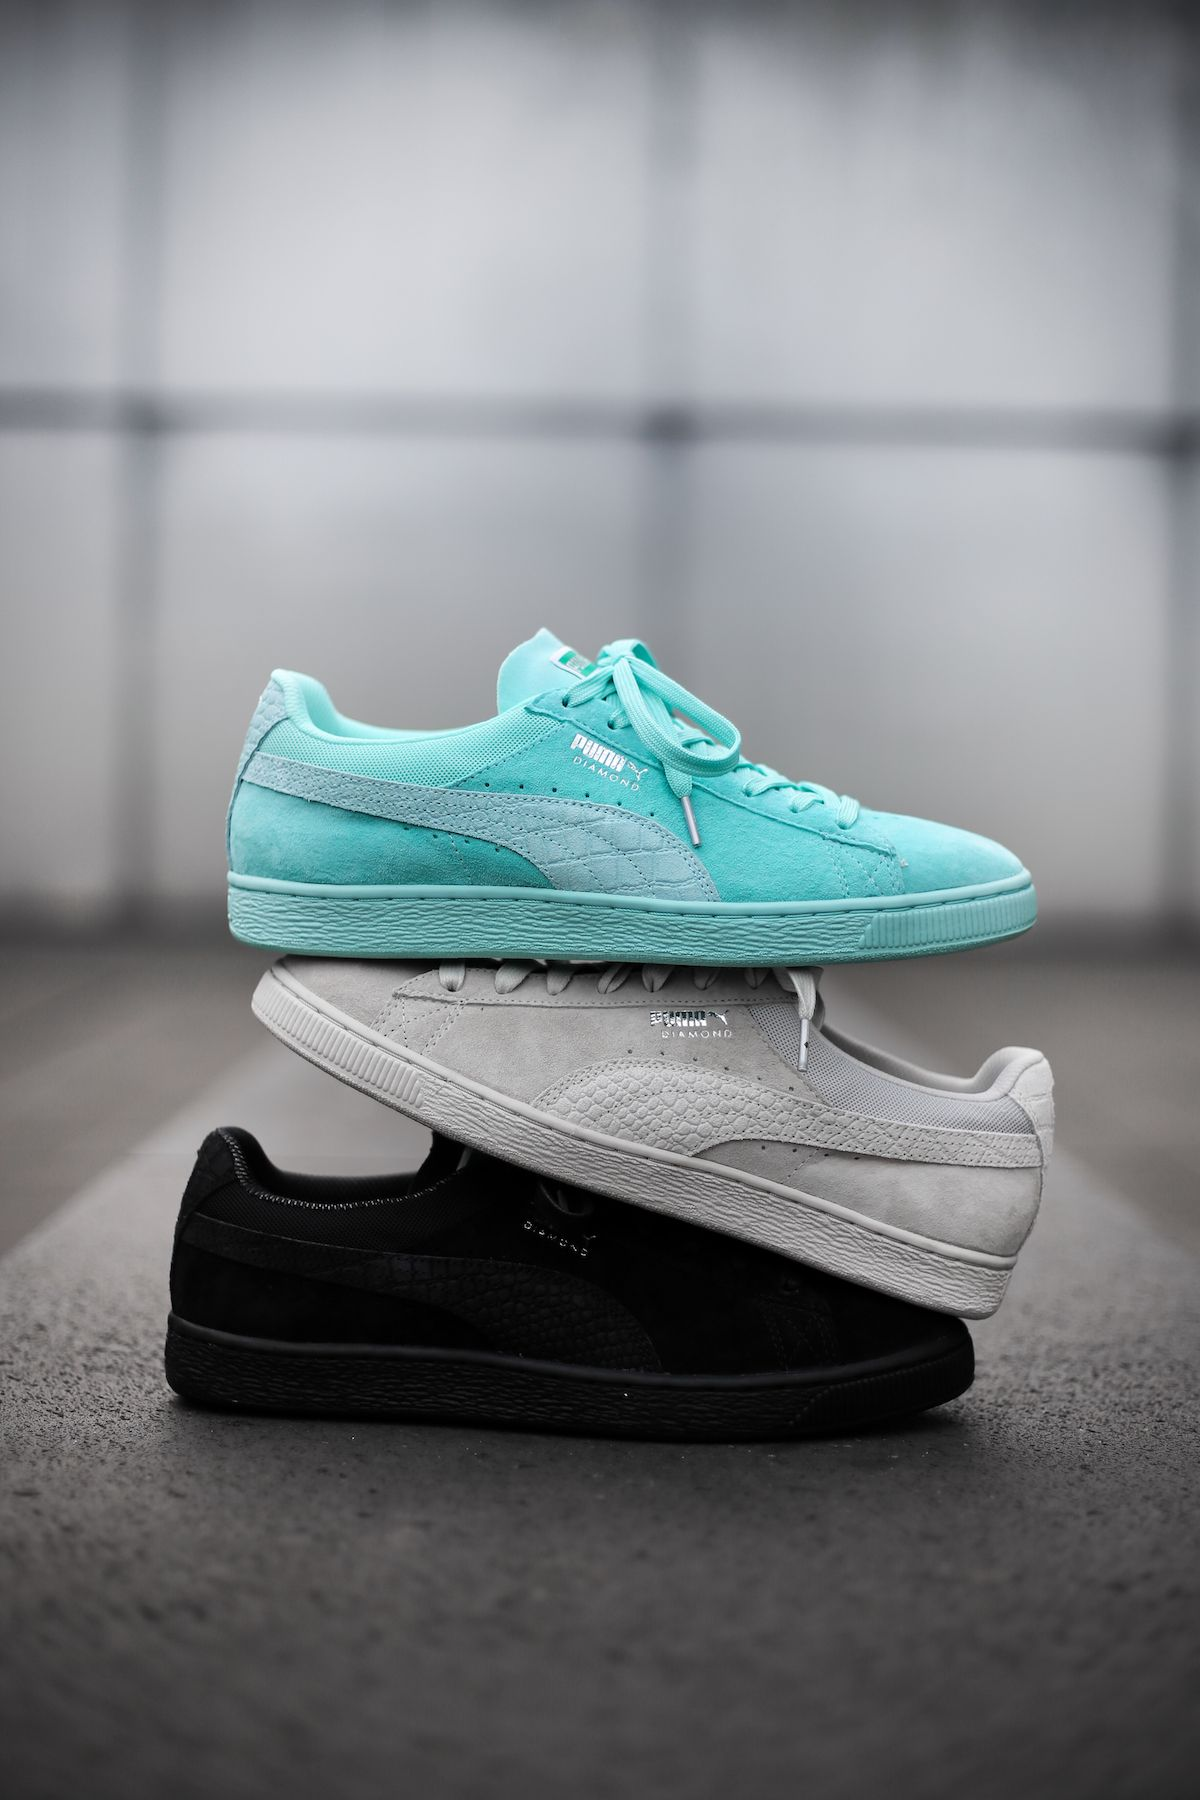 572b494cd33 Diamond Supply Co. Makes the Puma Suede for Skate - EU Kicks Sneaker  Magazine